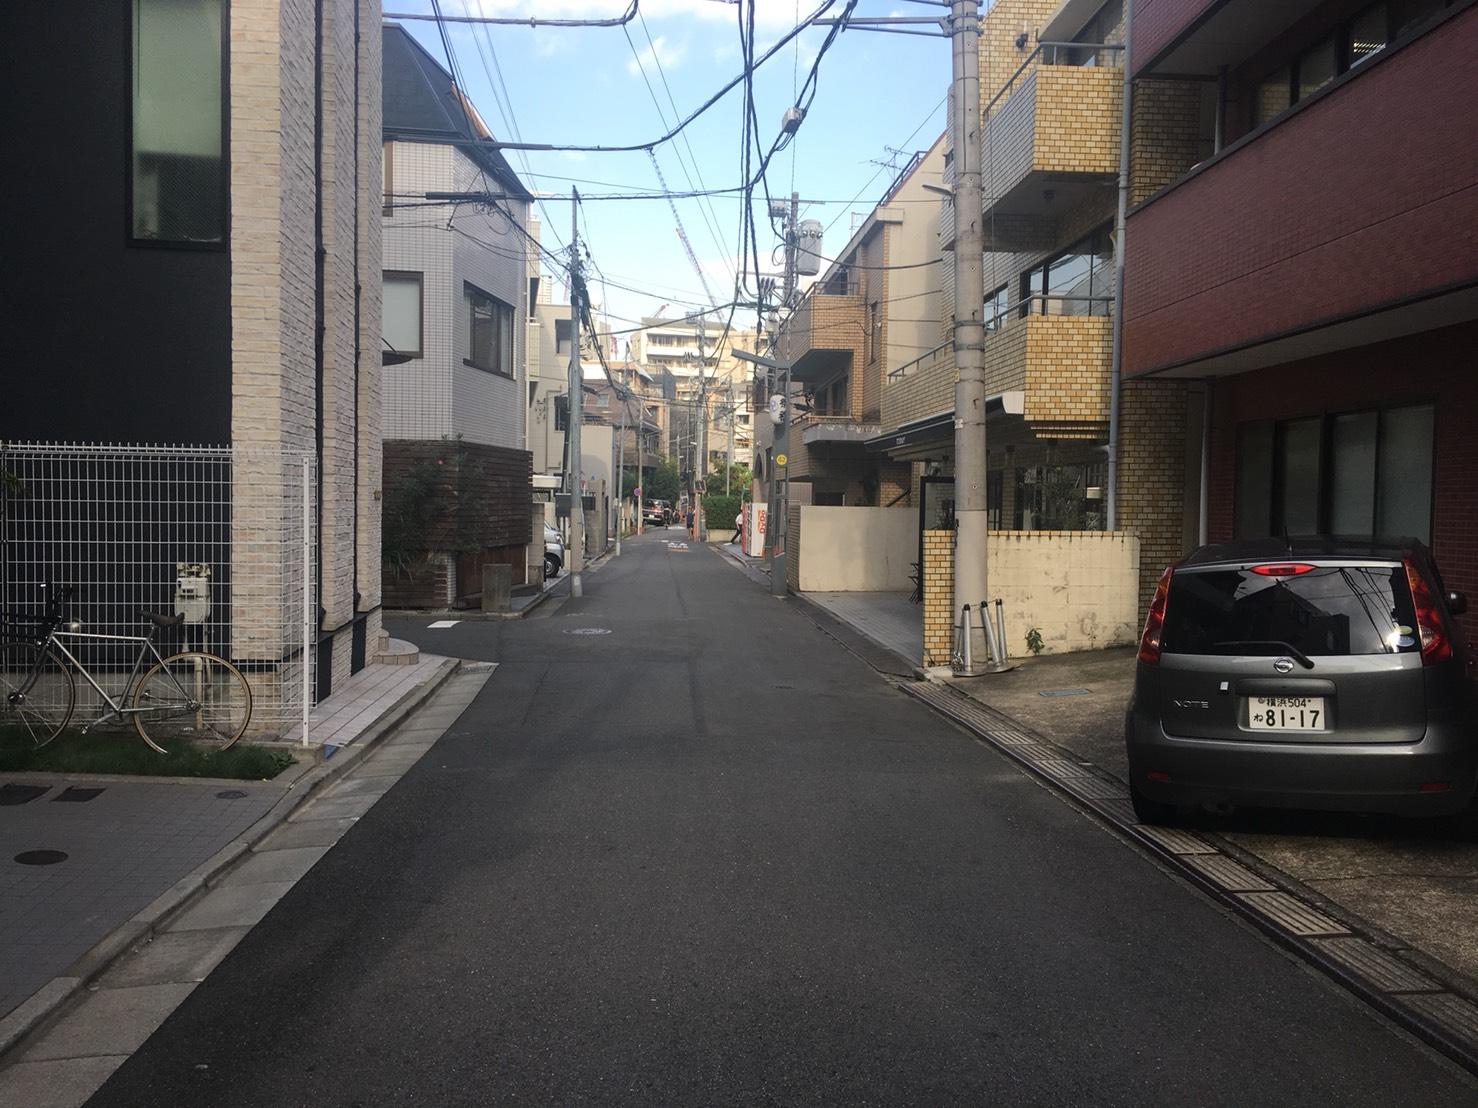 S__43180045.jpg